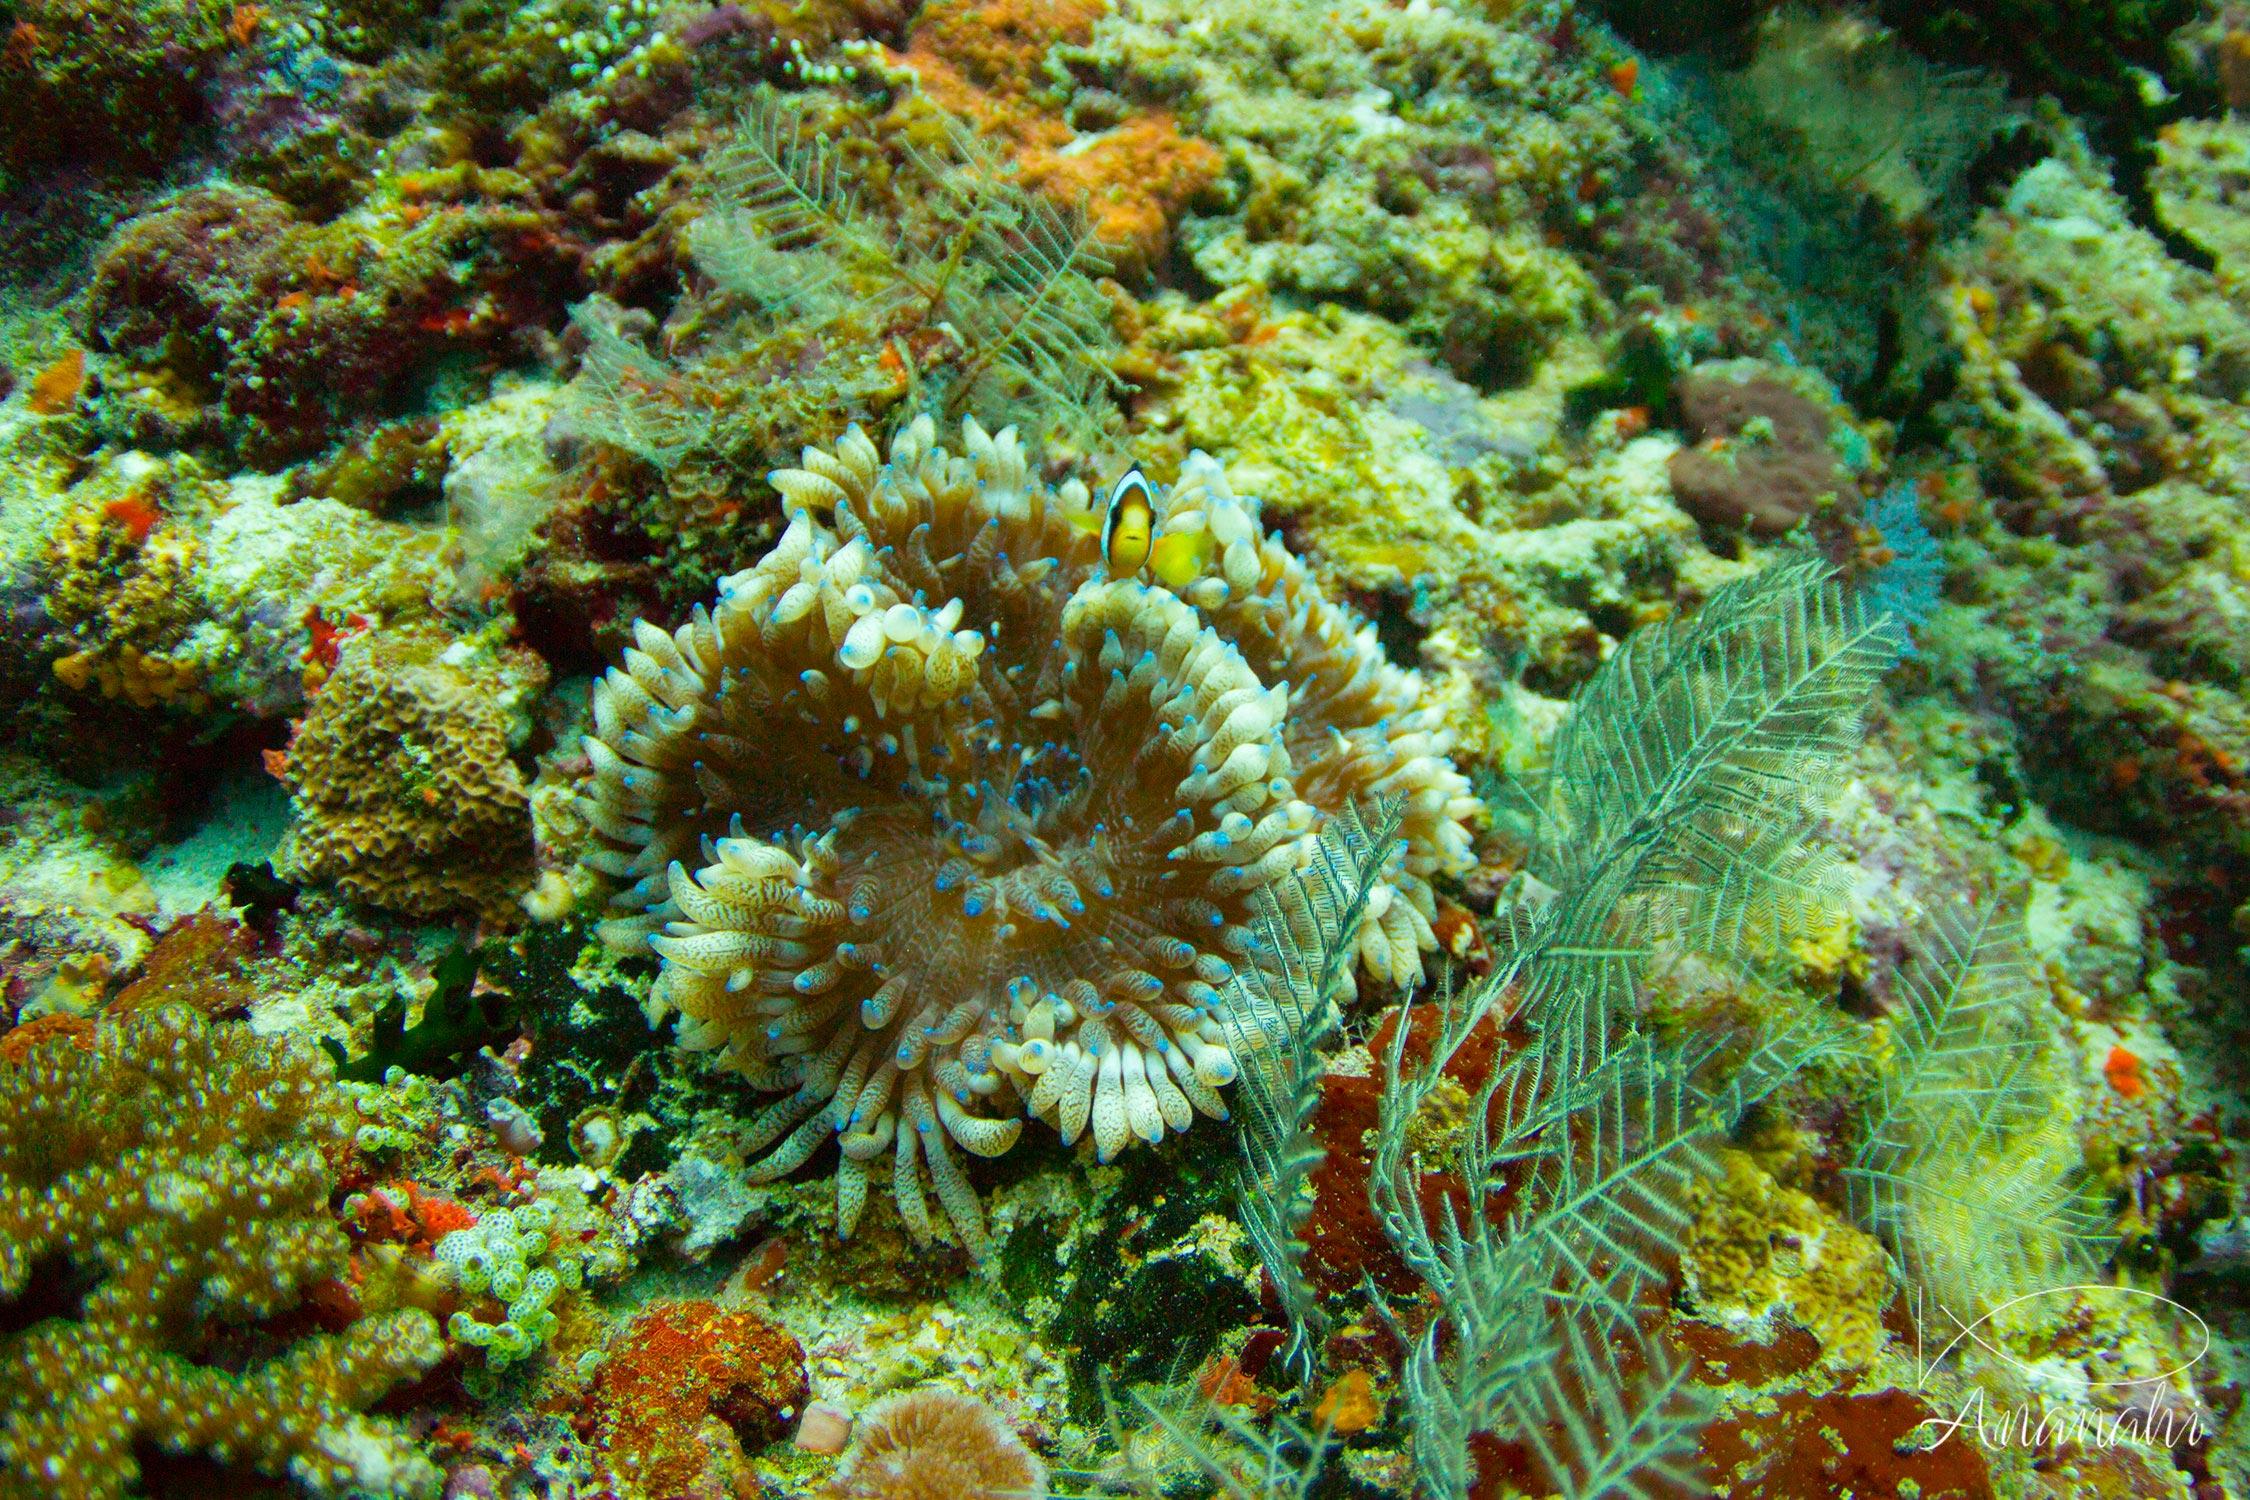 Leathery sea anemone of Maldives